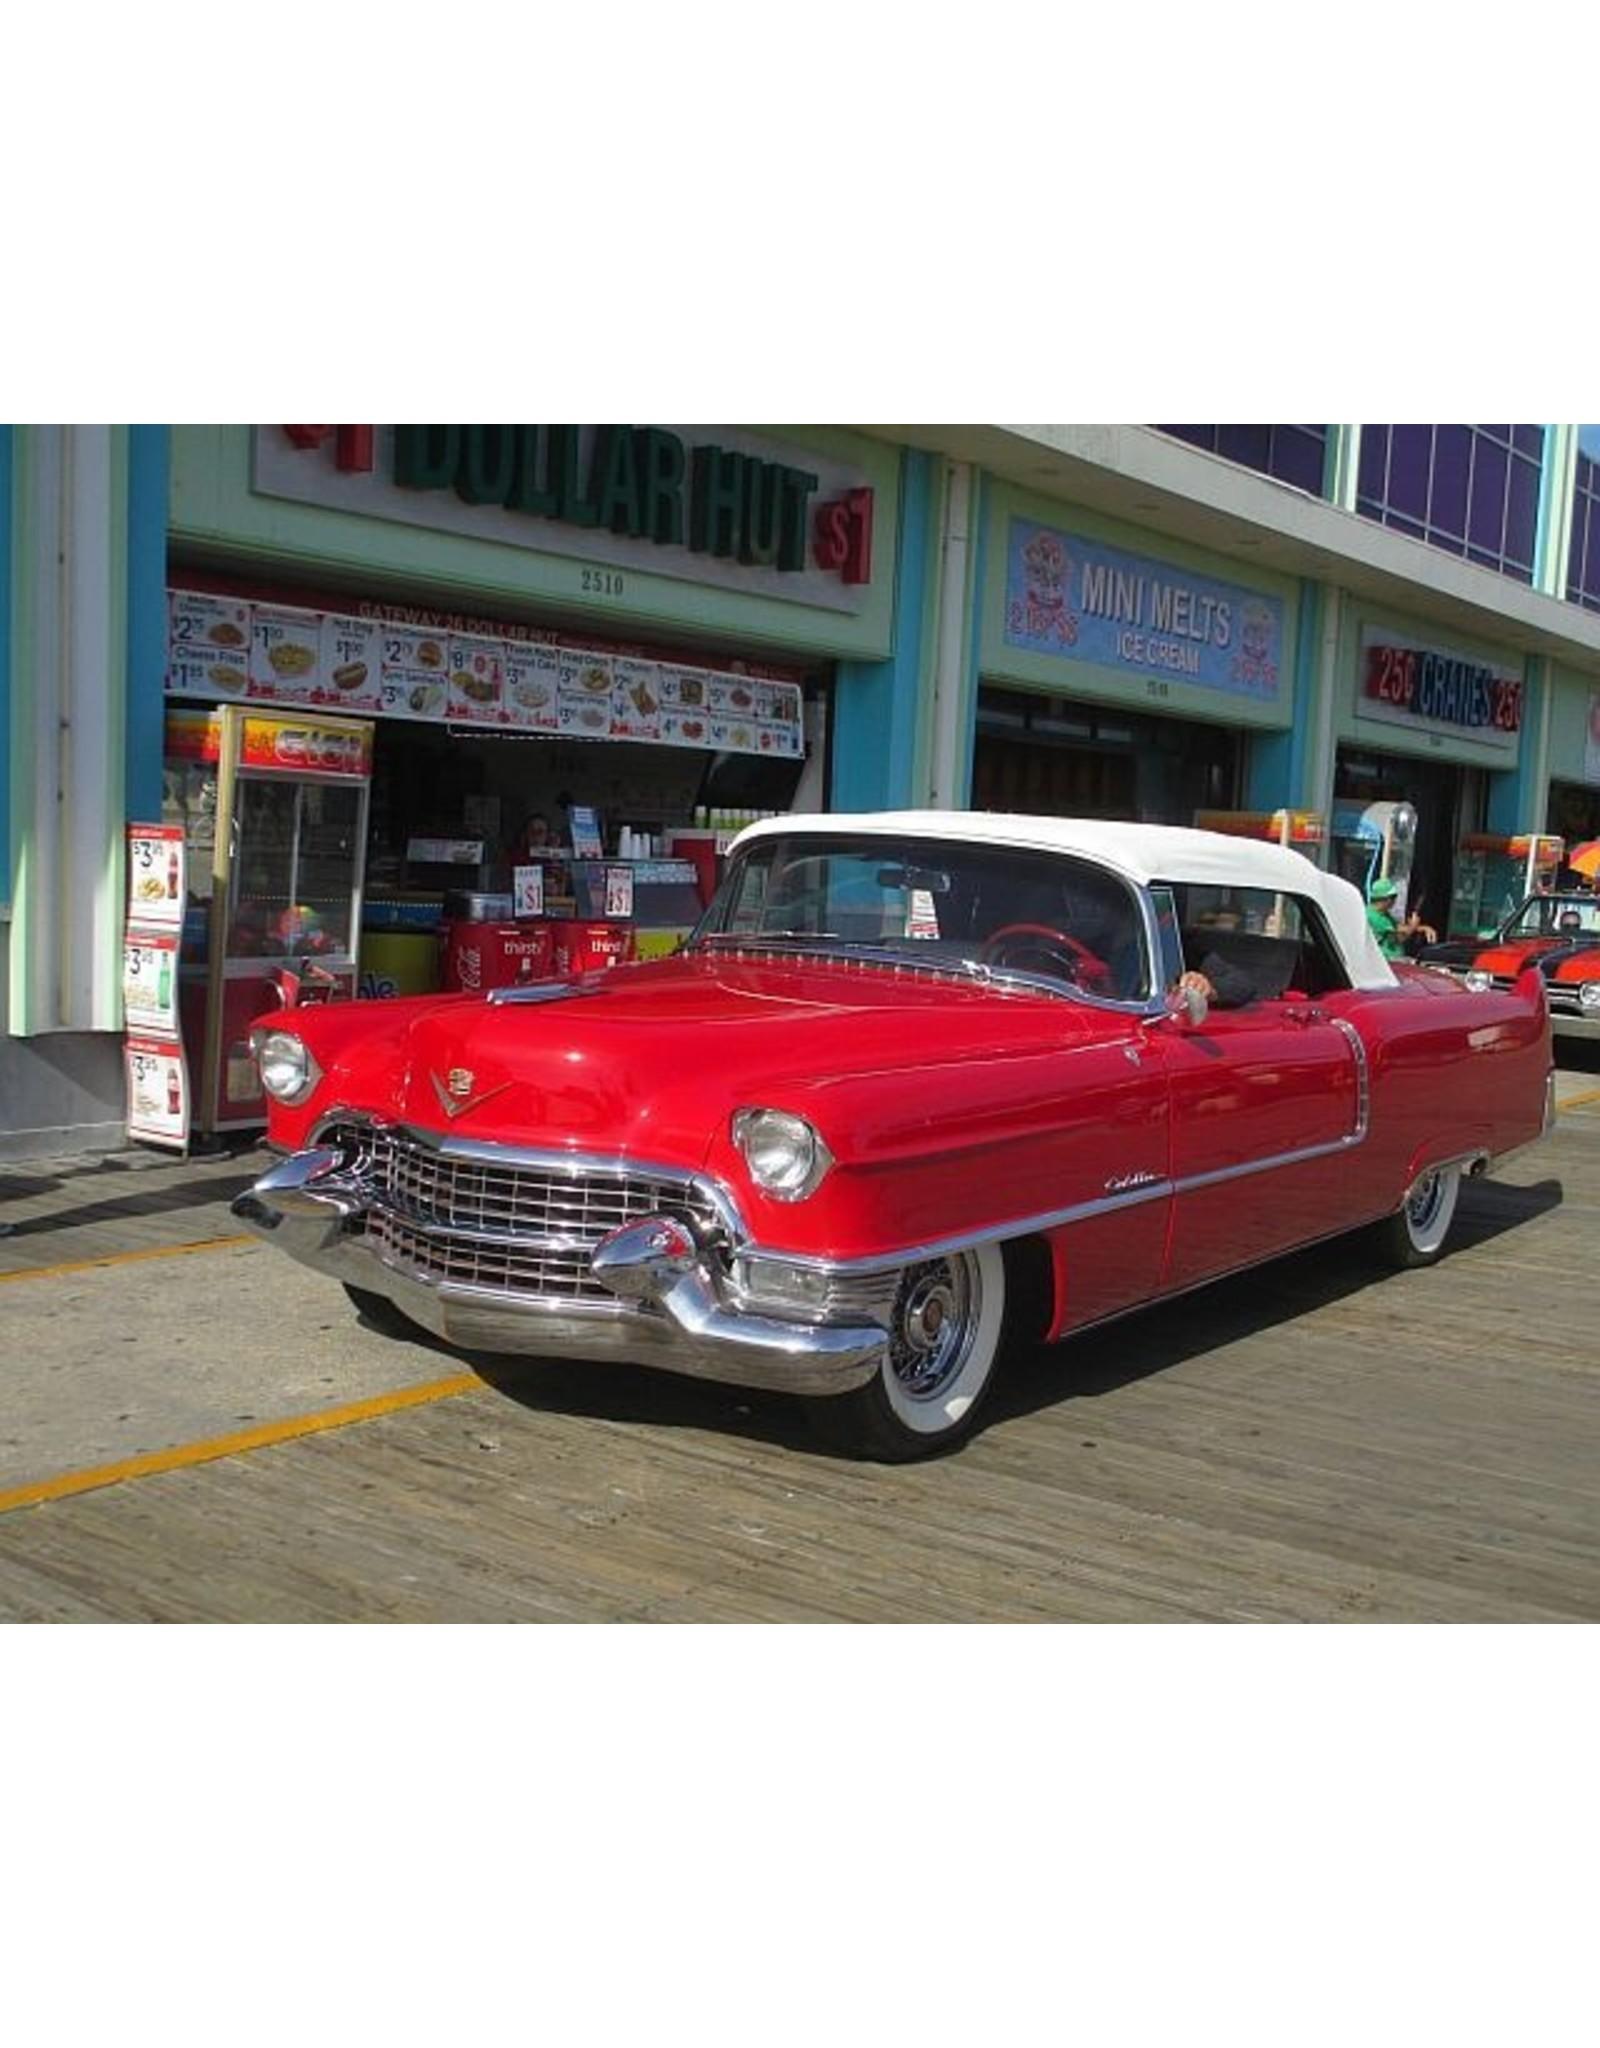 Cadillac(General Motors) CADILLAC SERIES 62 CONVERTIBLE 1955 (closed top)Dakota red